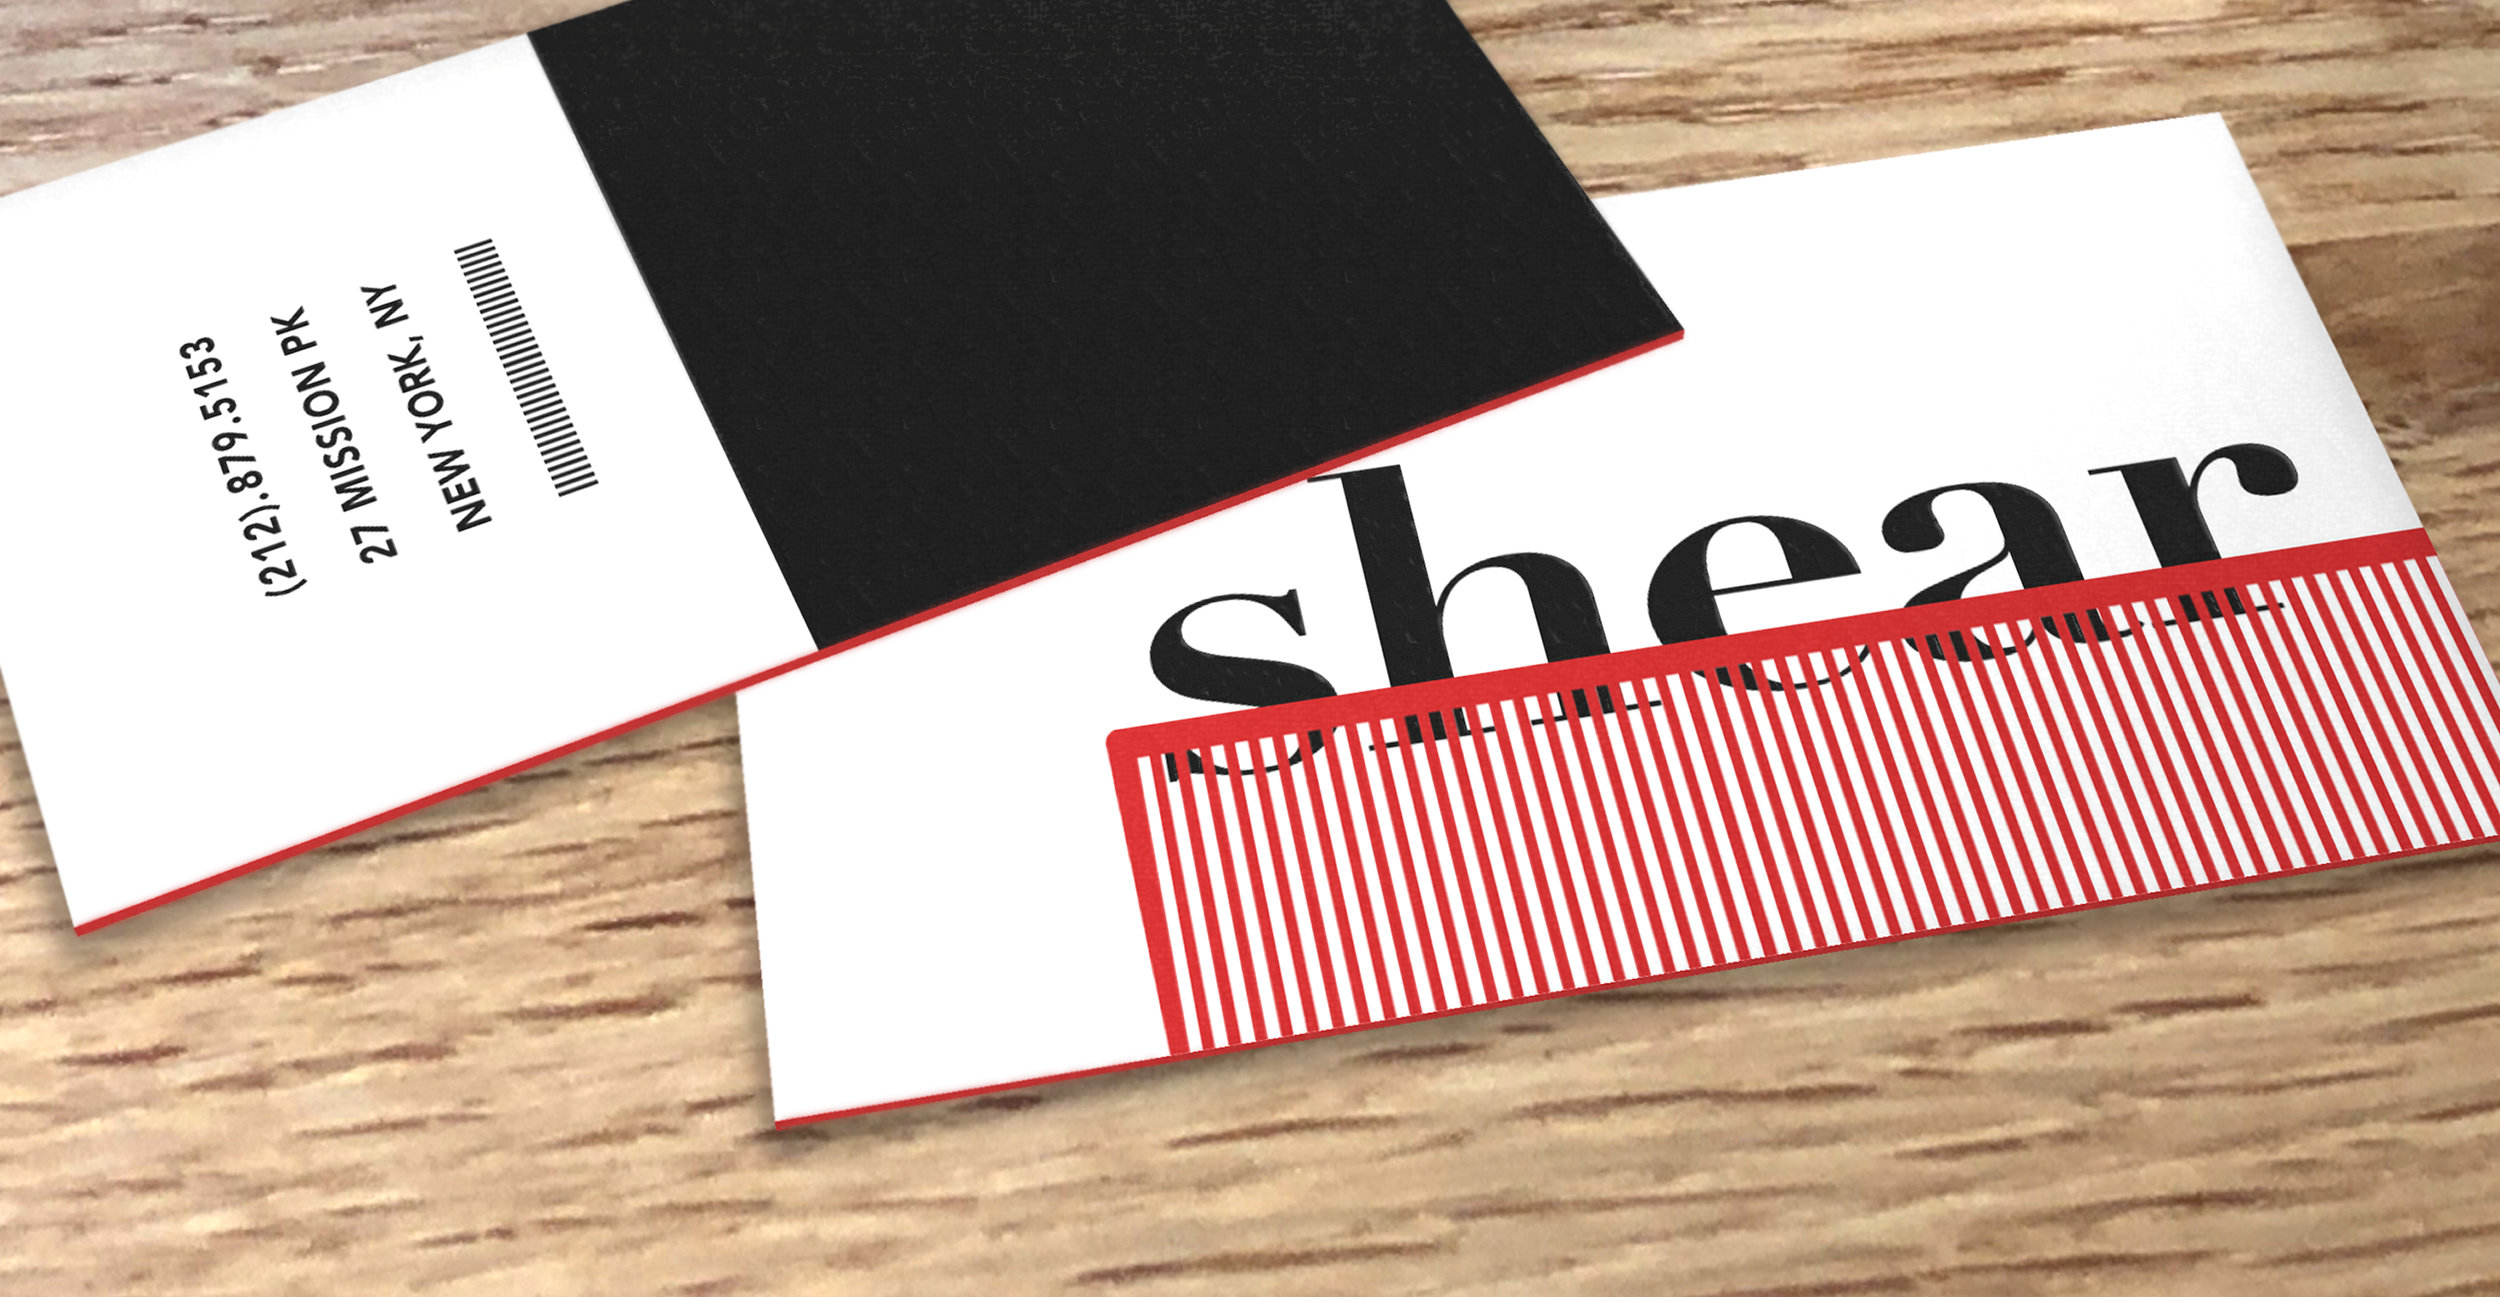 Shear Business Cards.jpg